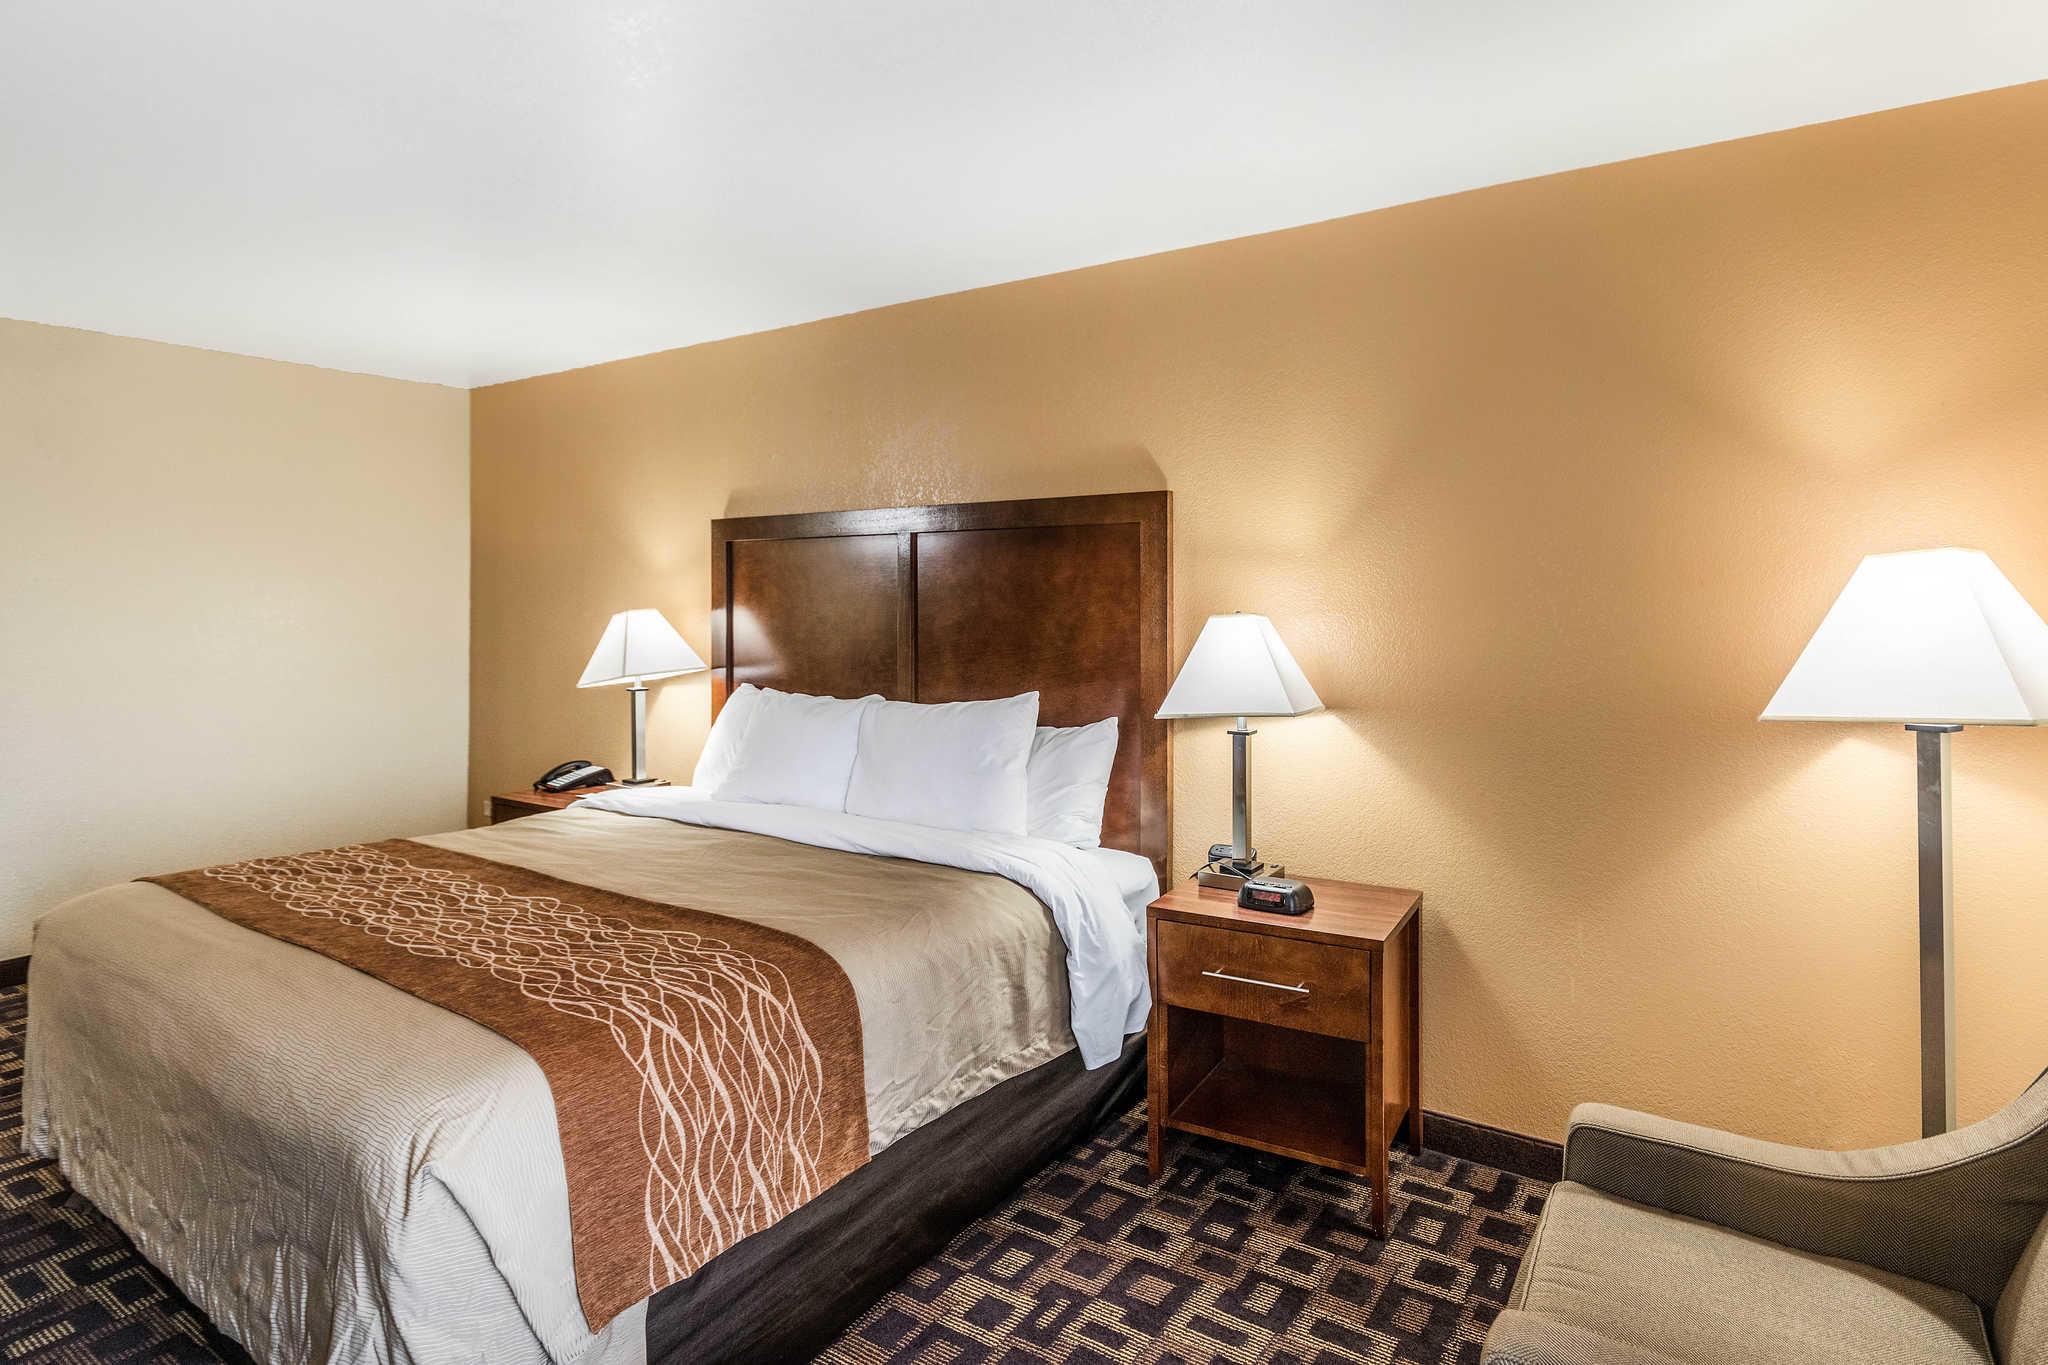 Comfort Inn & Suites North Aurora - Naperville image 19